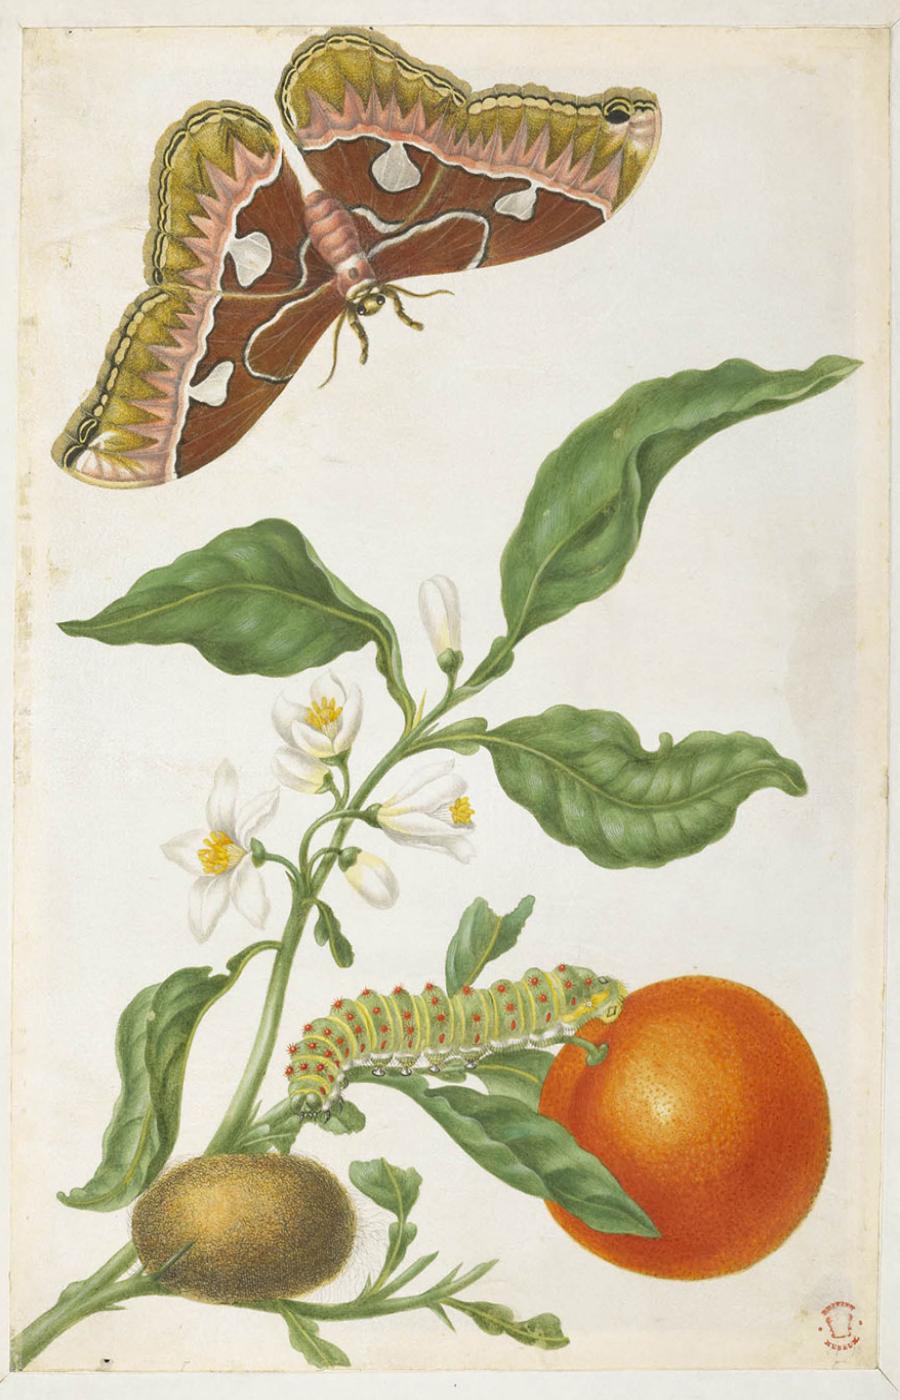 Maria Sibylla Merian, grabado en cobre iluminado de Metamorphosis insectorum Surinamensium, Lámina XXIII. Solanum mammosum 1705. Wikimedia Commons